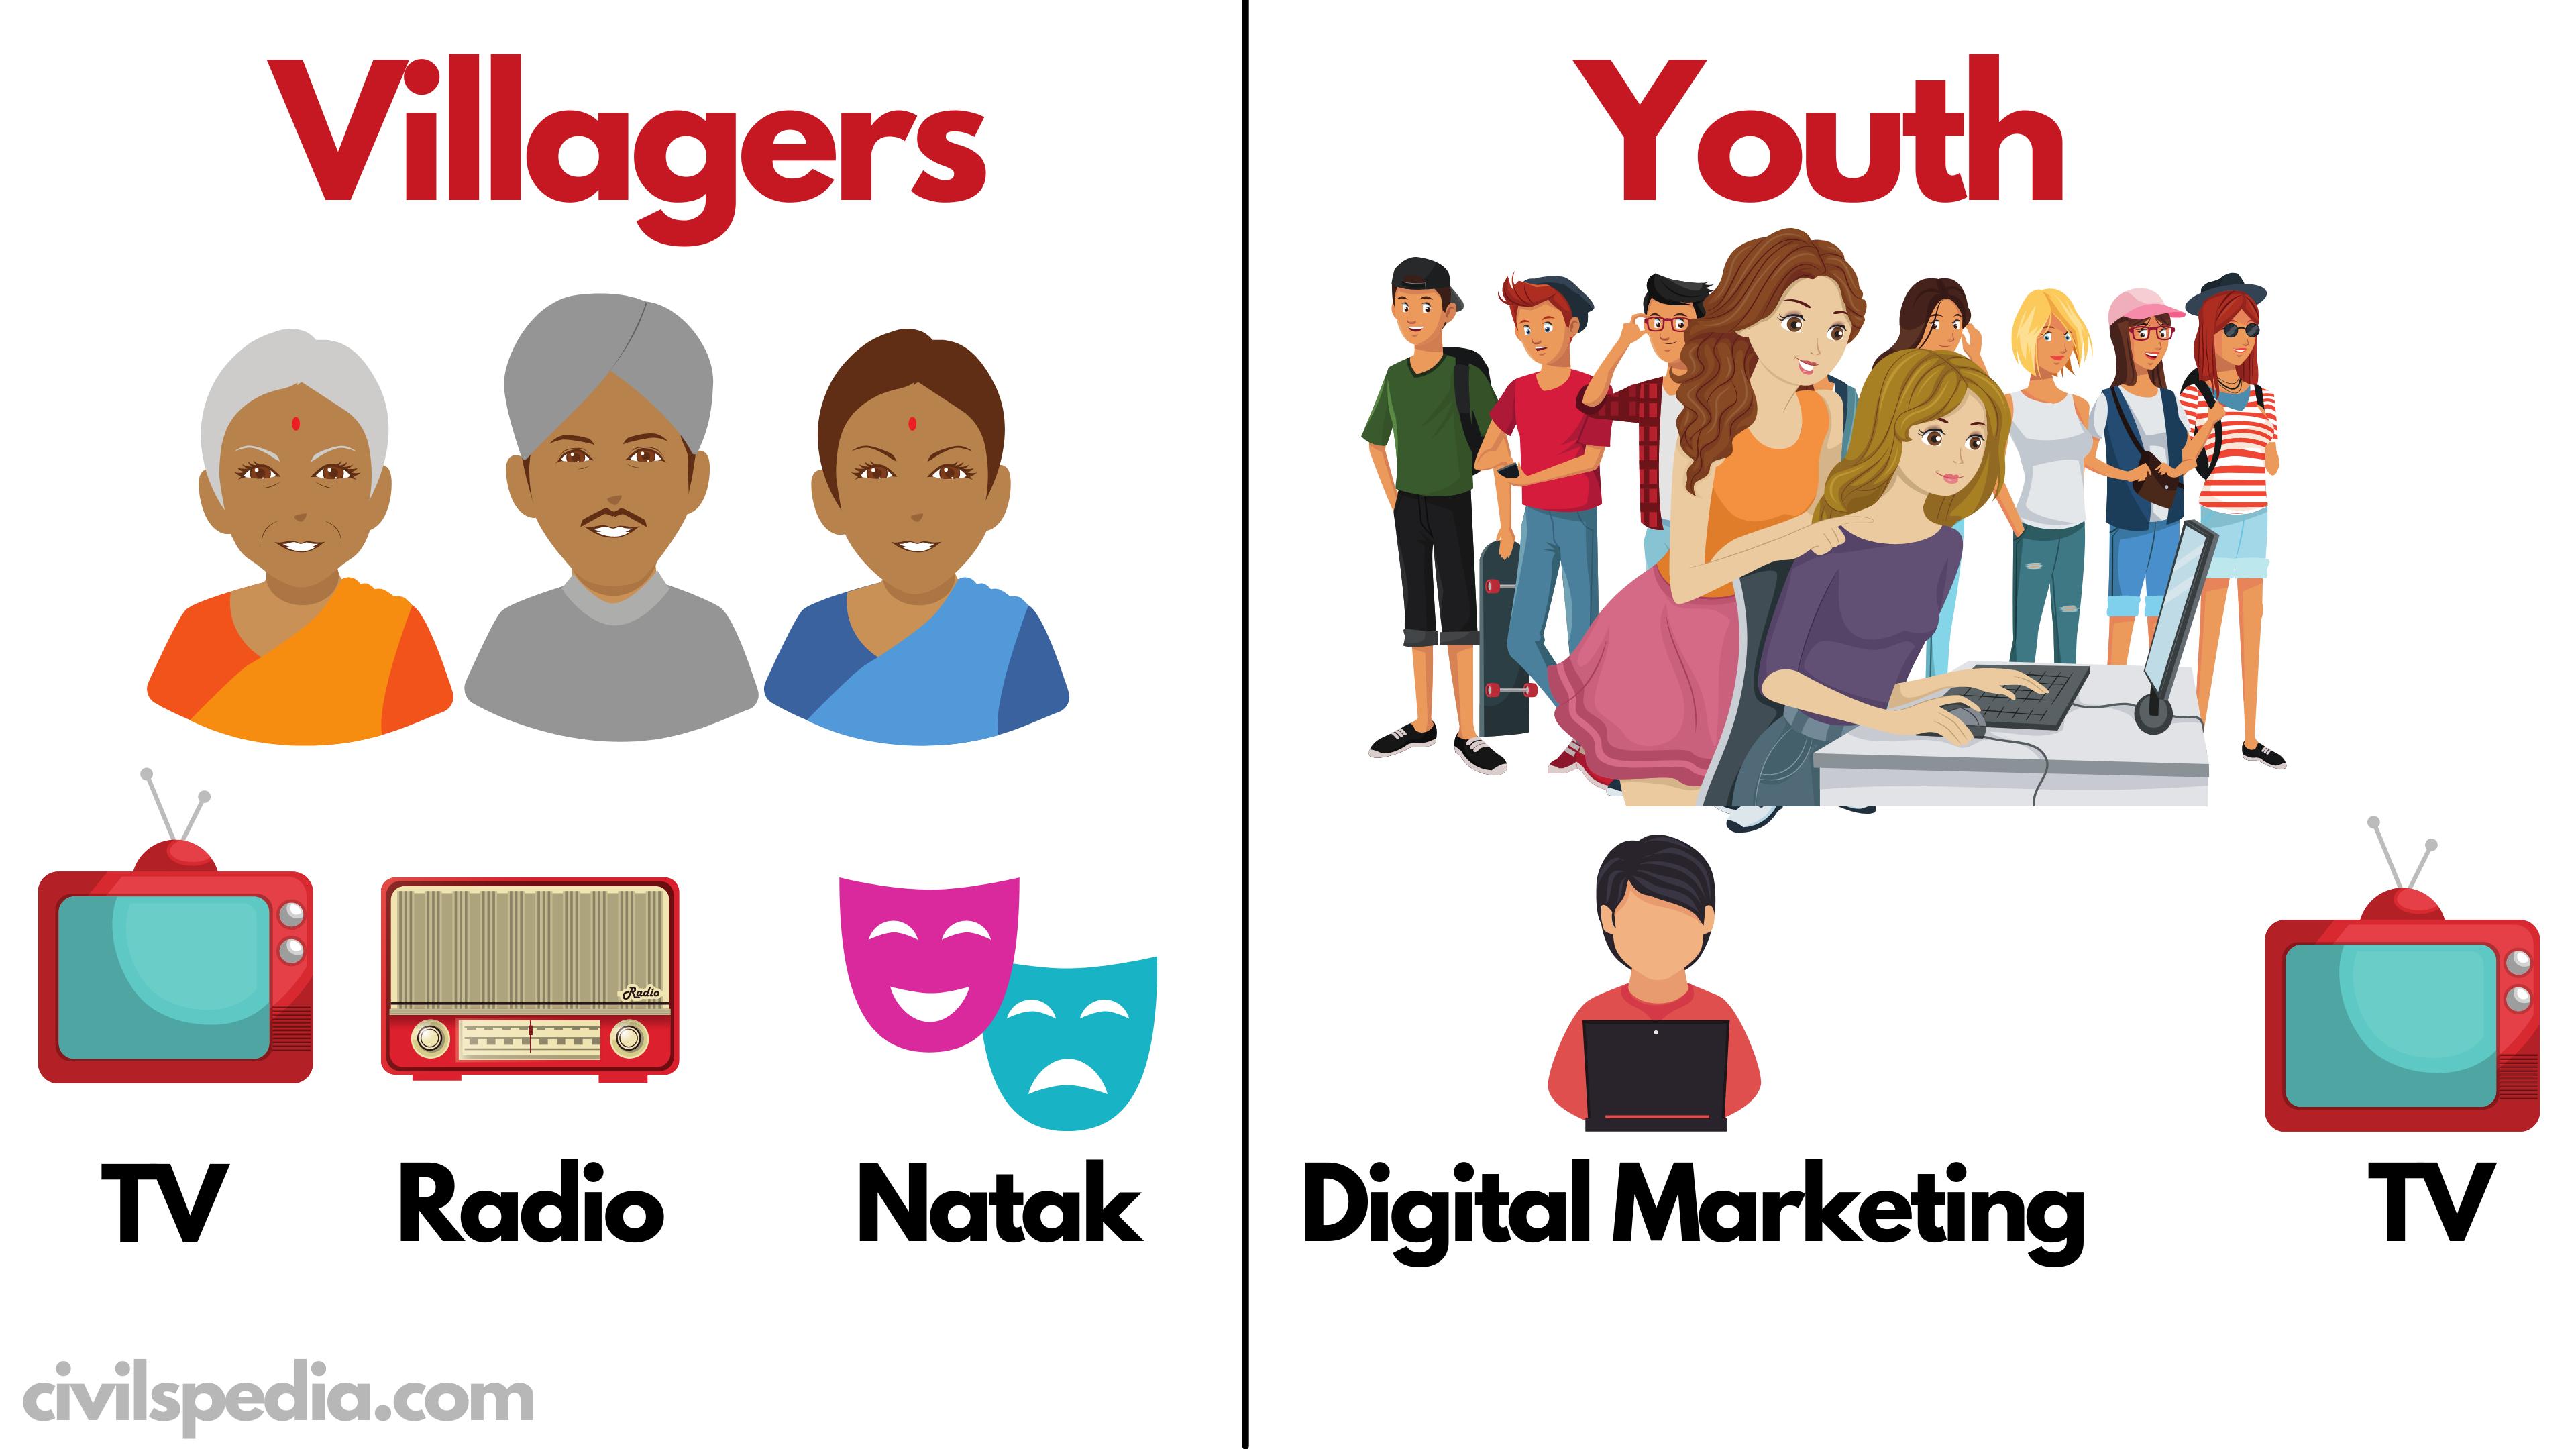 Radio  civilsped'  •a.com  Natak  Digital Marketing